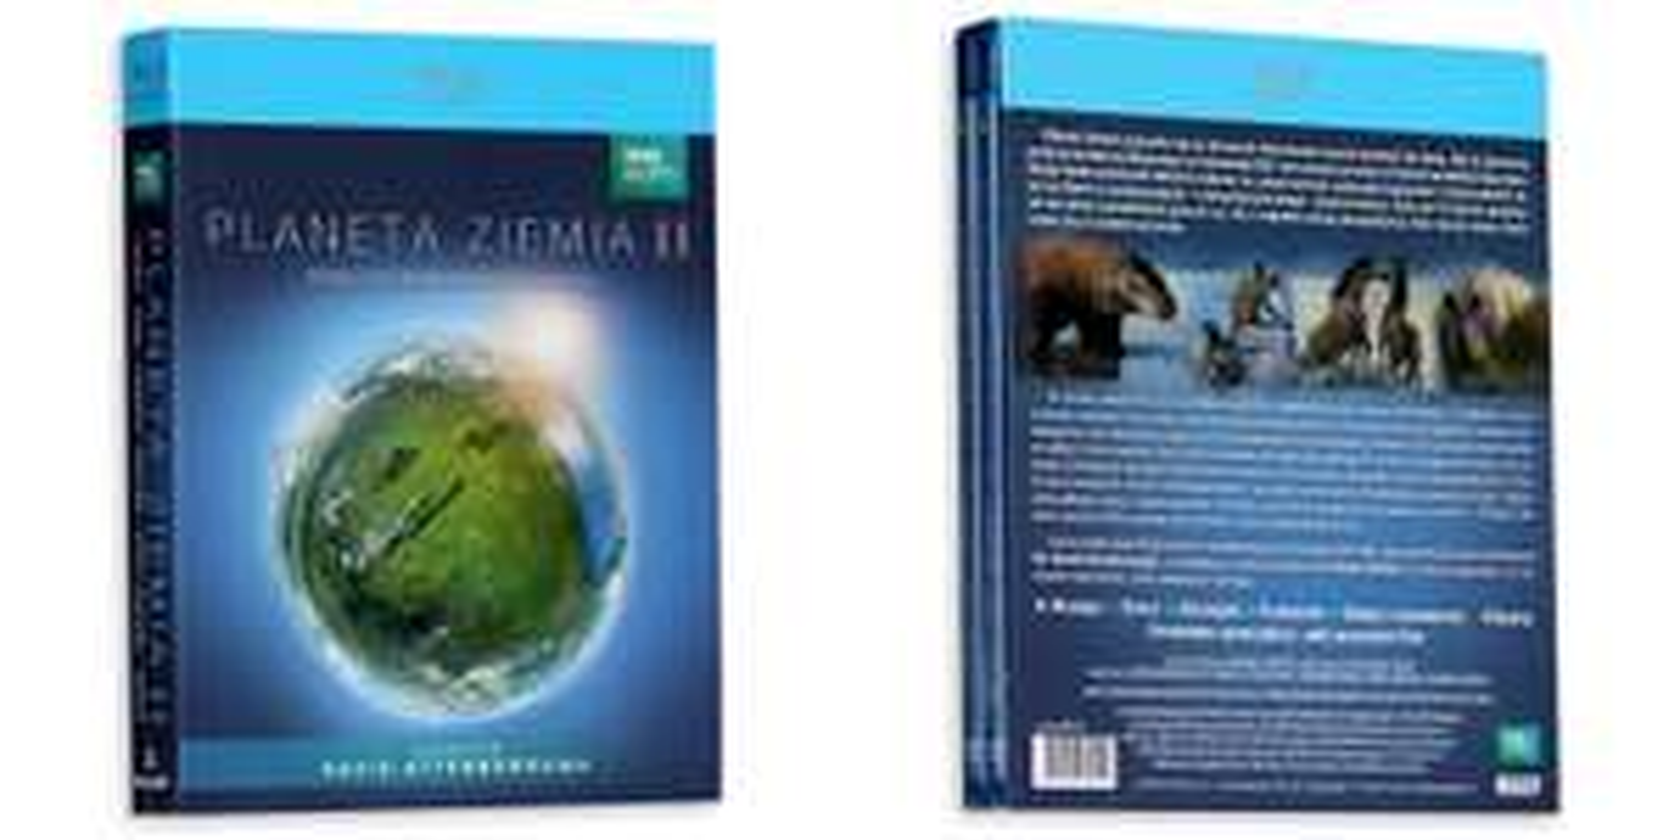 Planeta Ziemia 2 na Blu-ray - Empik